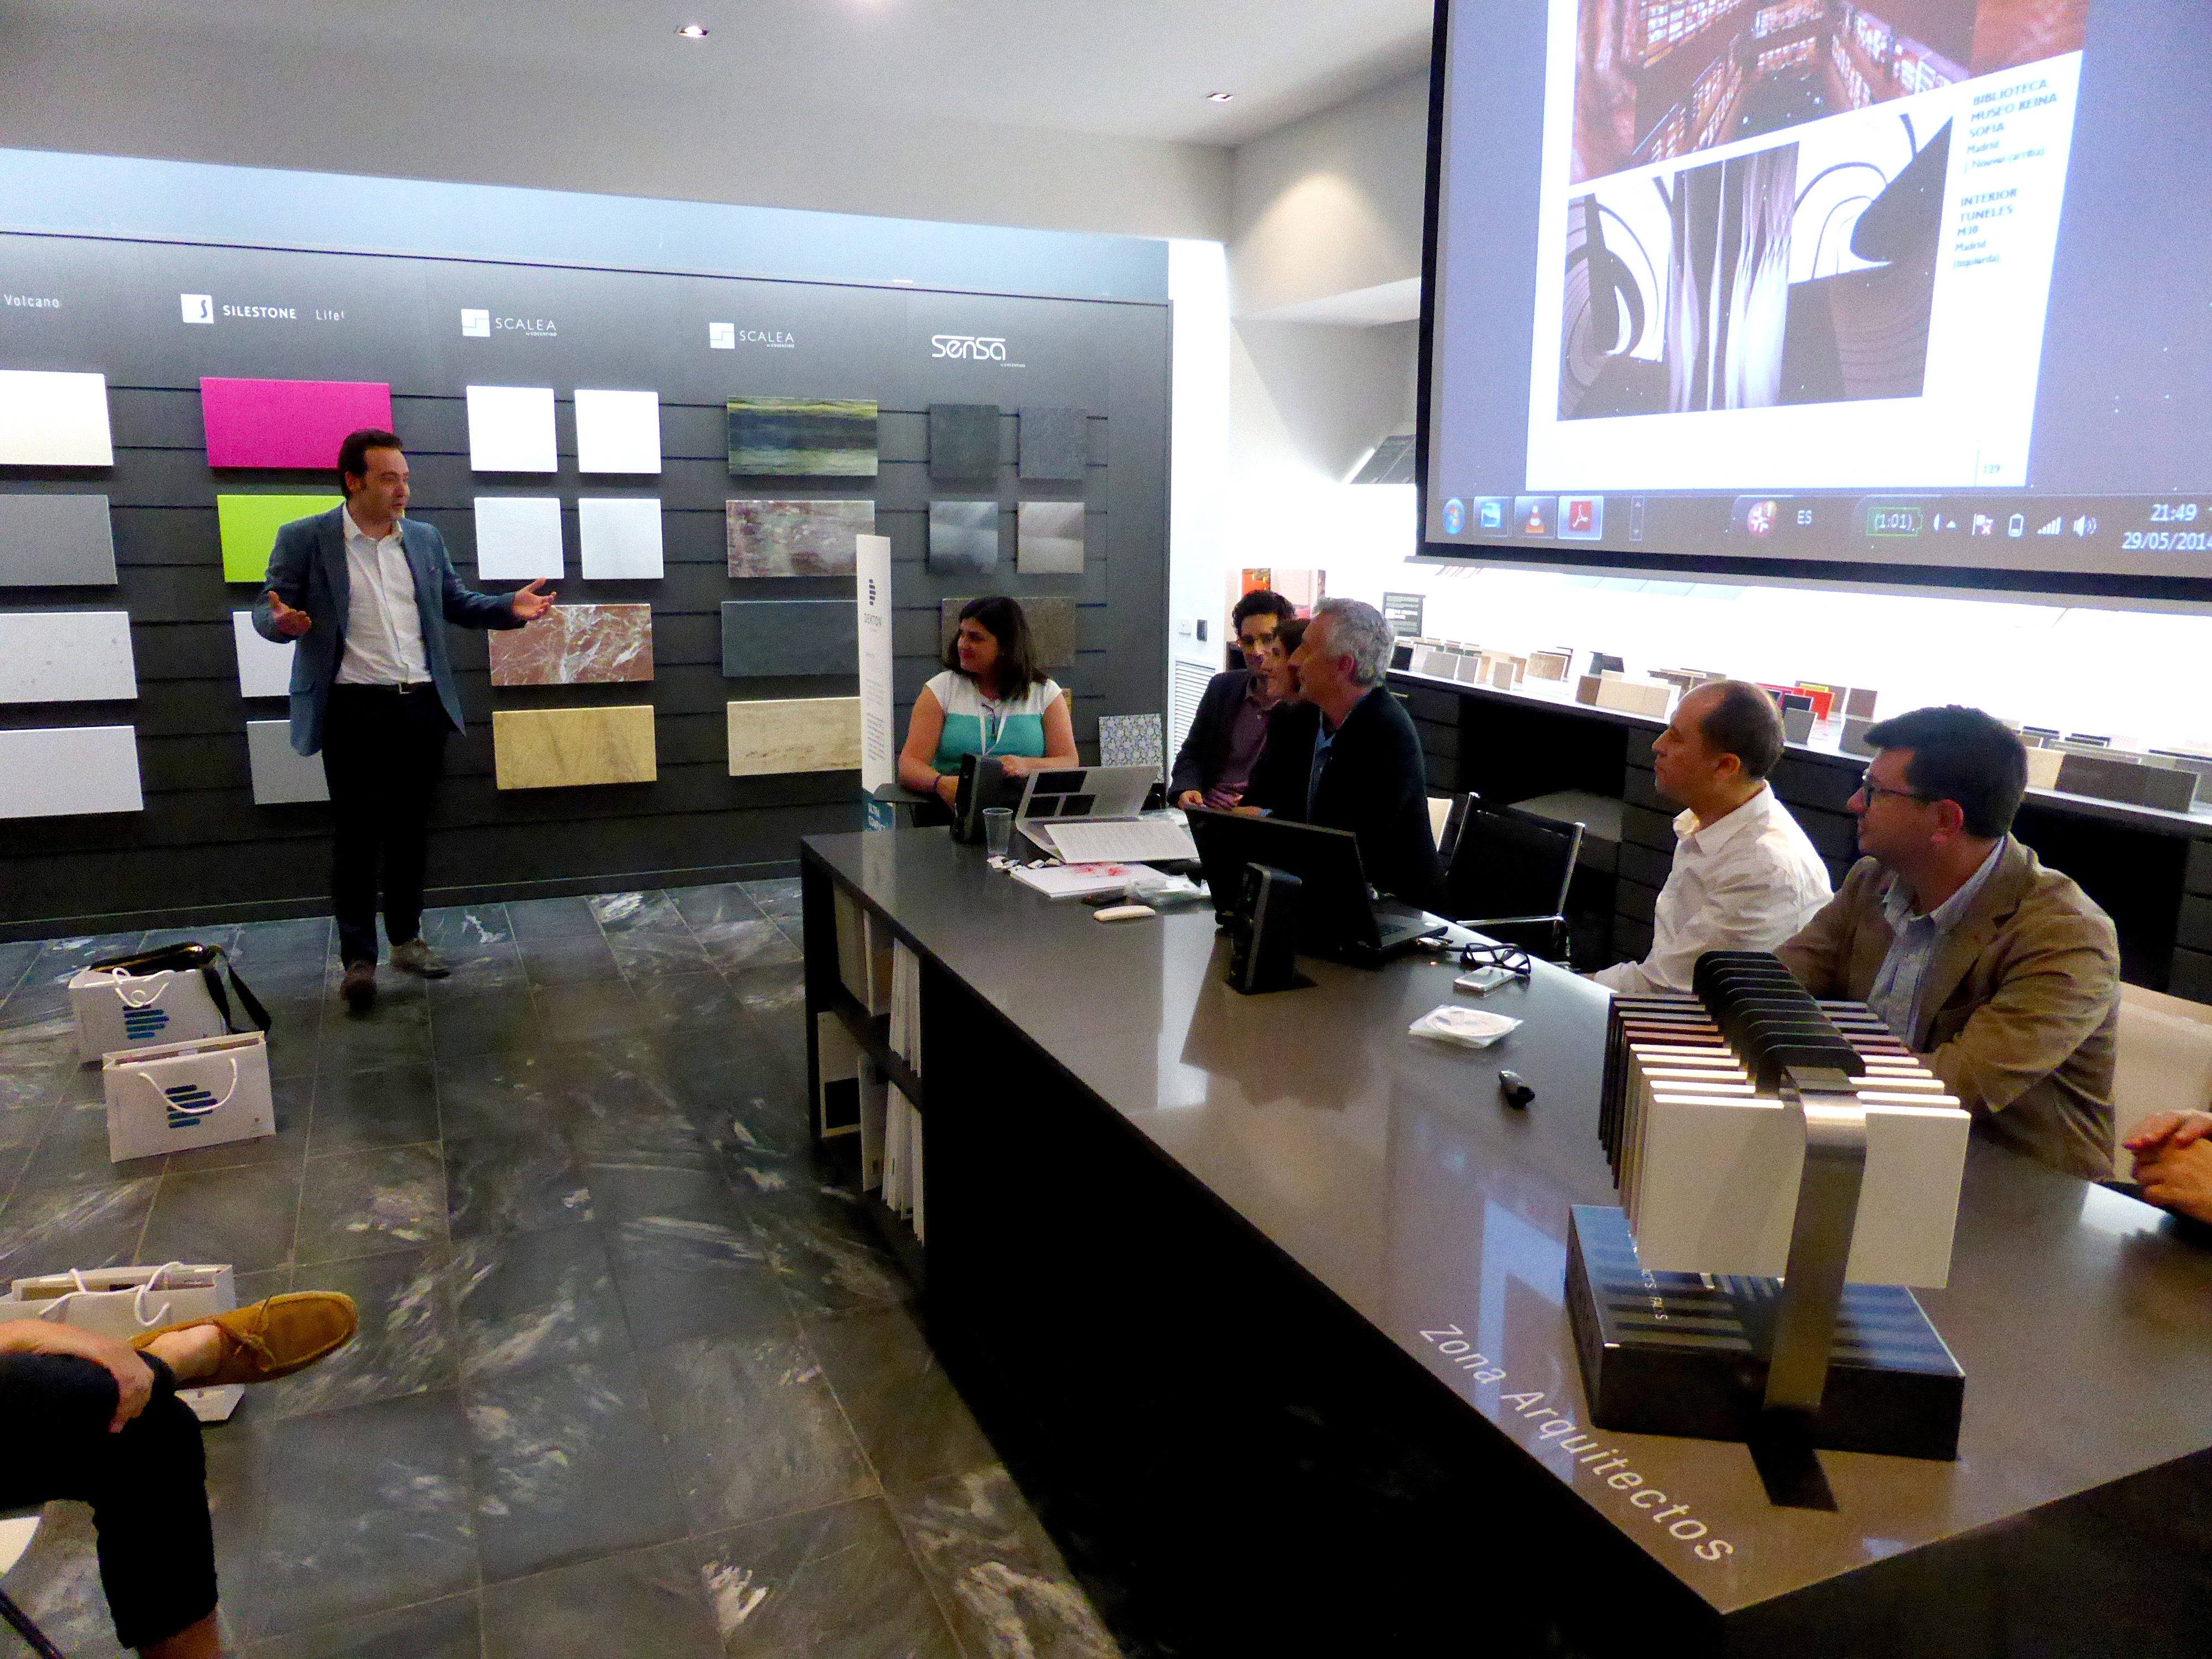 Cosentino zaragoza center acoge la jornada hablando de for Estudios arquitectura zaragoza